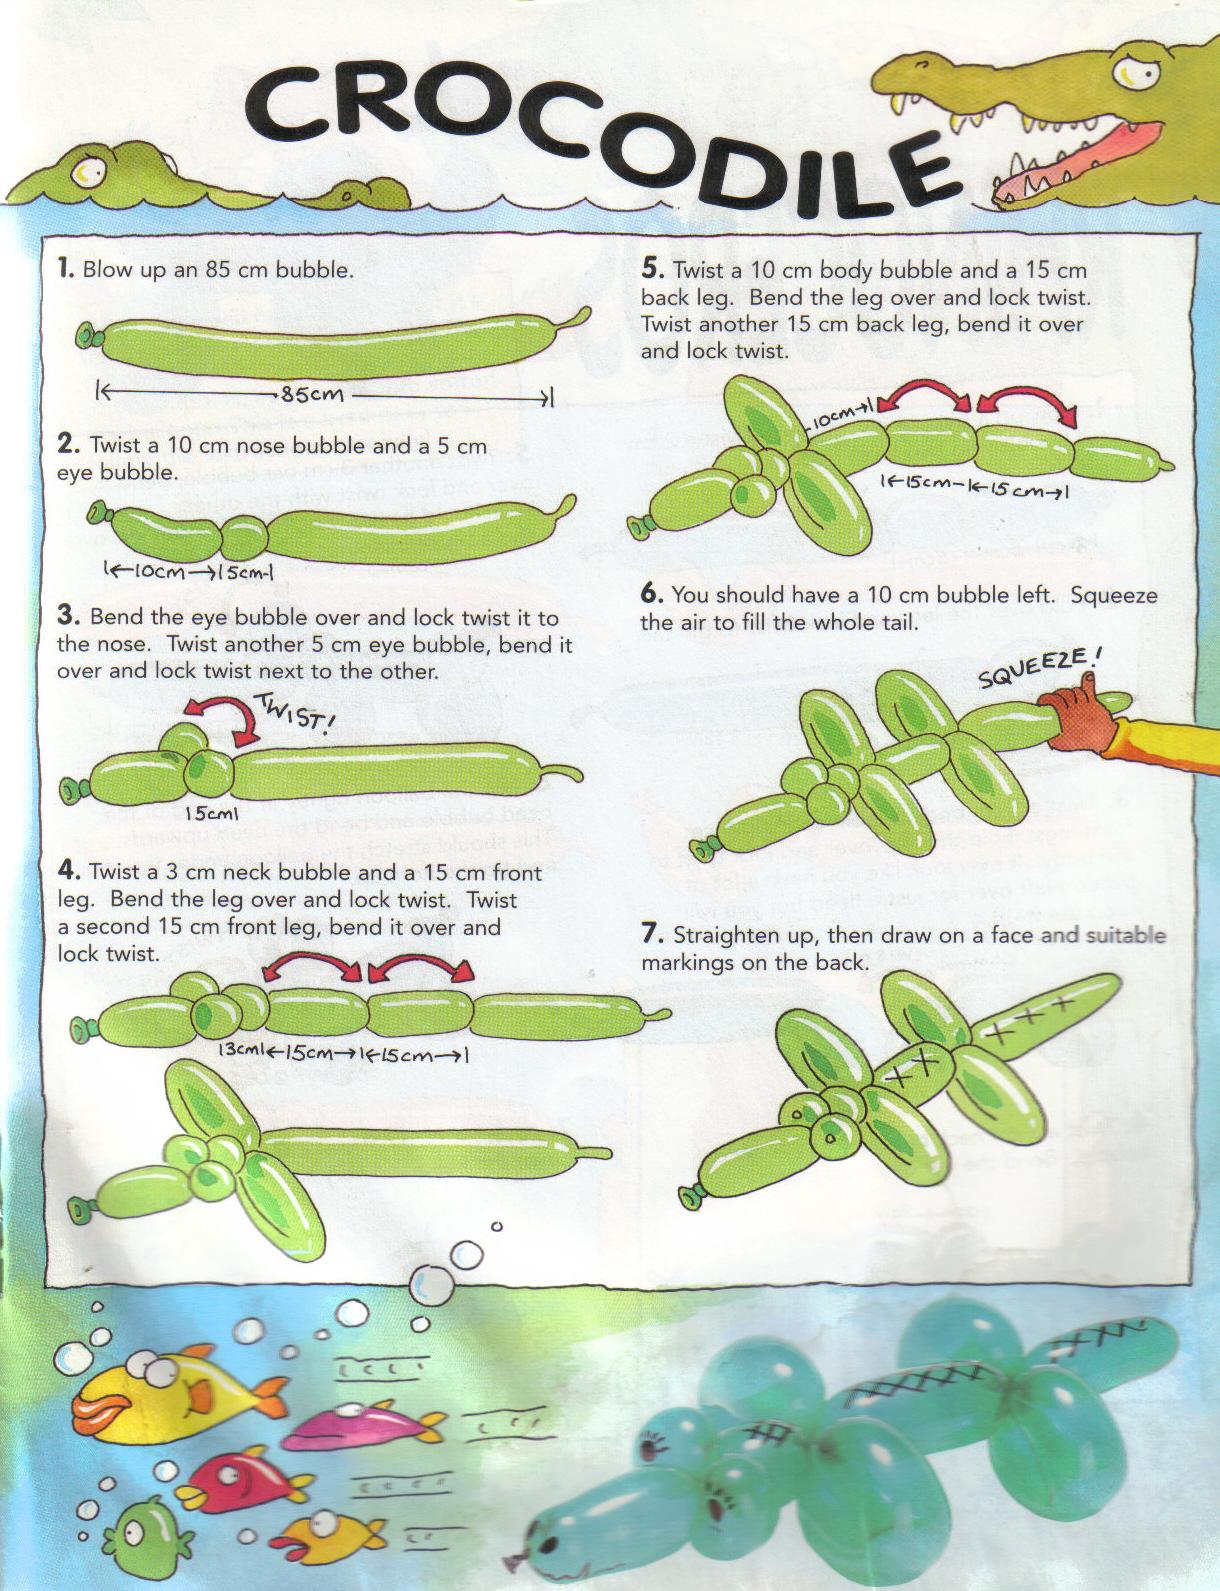 BA - Crocodile